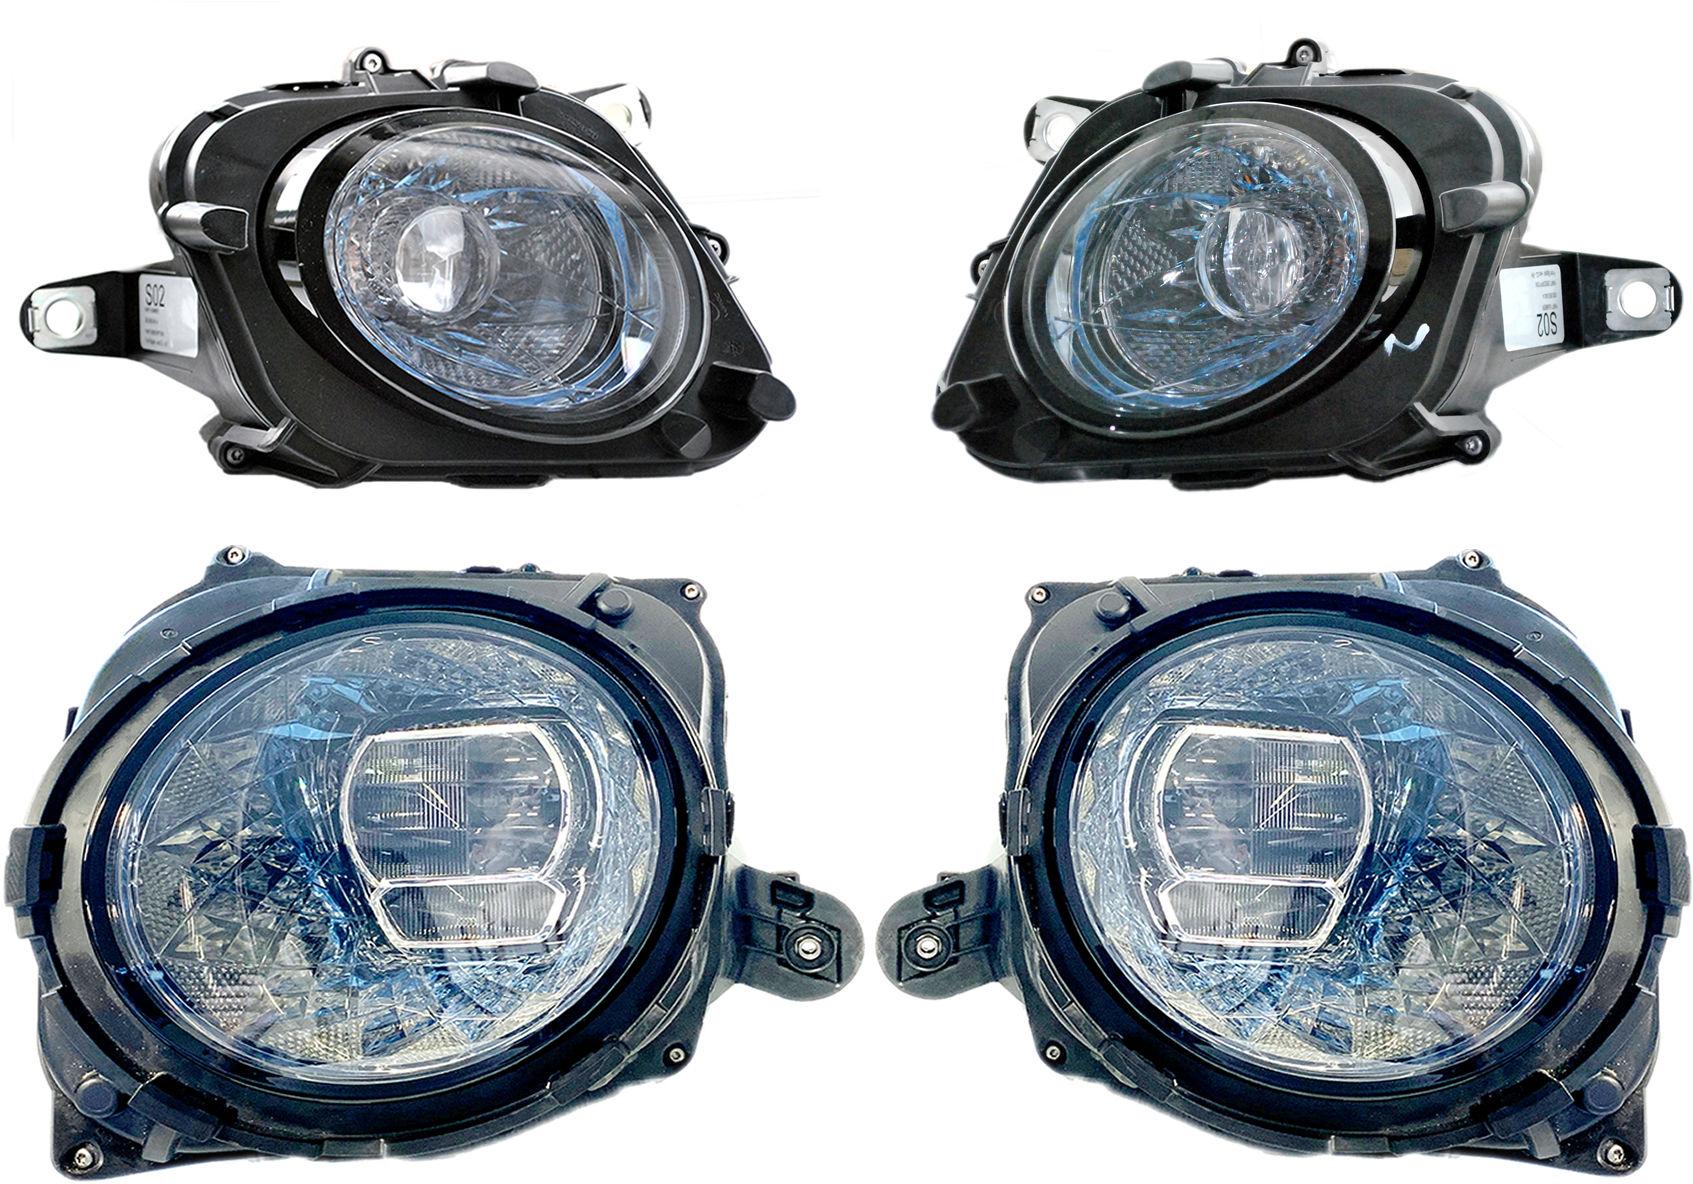 2X NOWE ORYGINALNE REFLEKTORY FULL LED KOMPLETNE + 2X KIERUNKOWSKAZY BENTLEY CONTINENTAL GT GTC 3SD094006E 3SD953042A